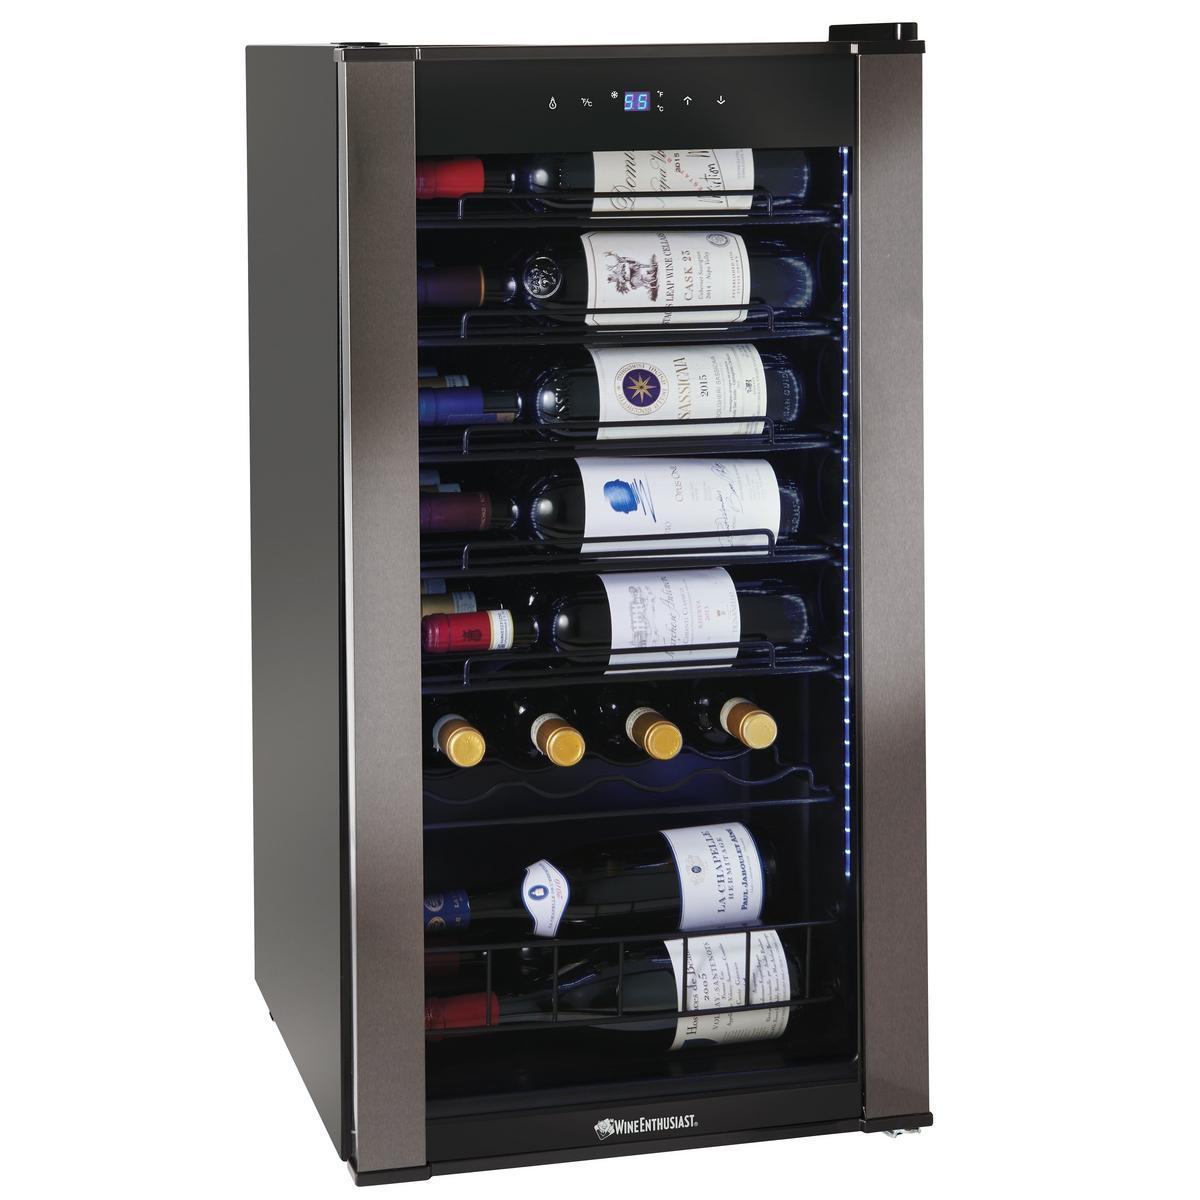 Wine Enthusiast VinoView 28 Bottle